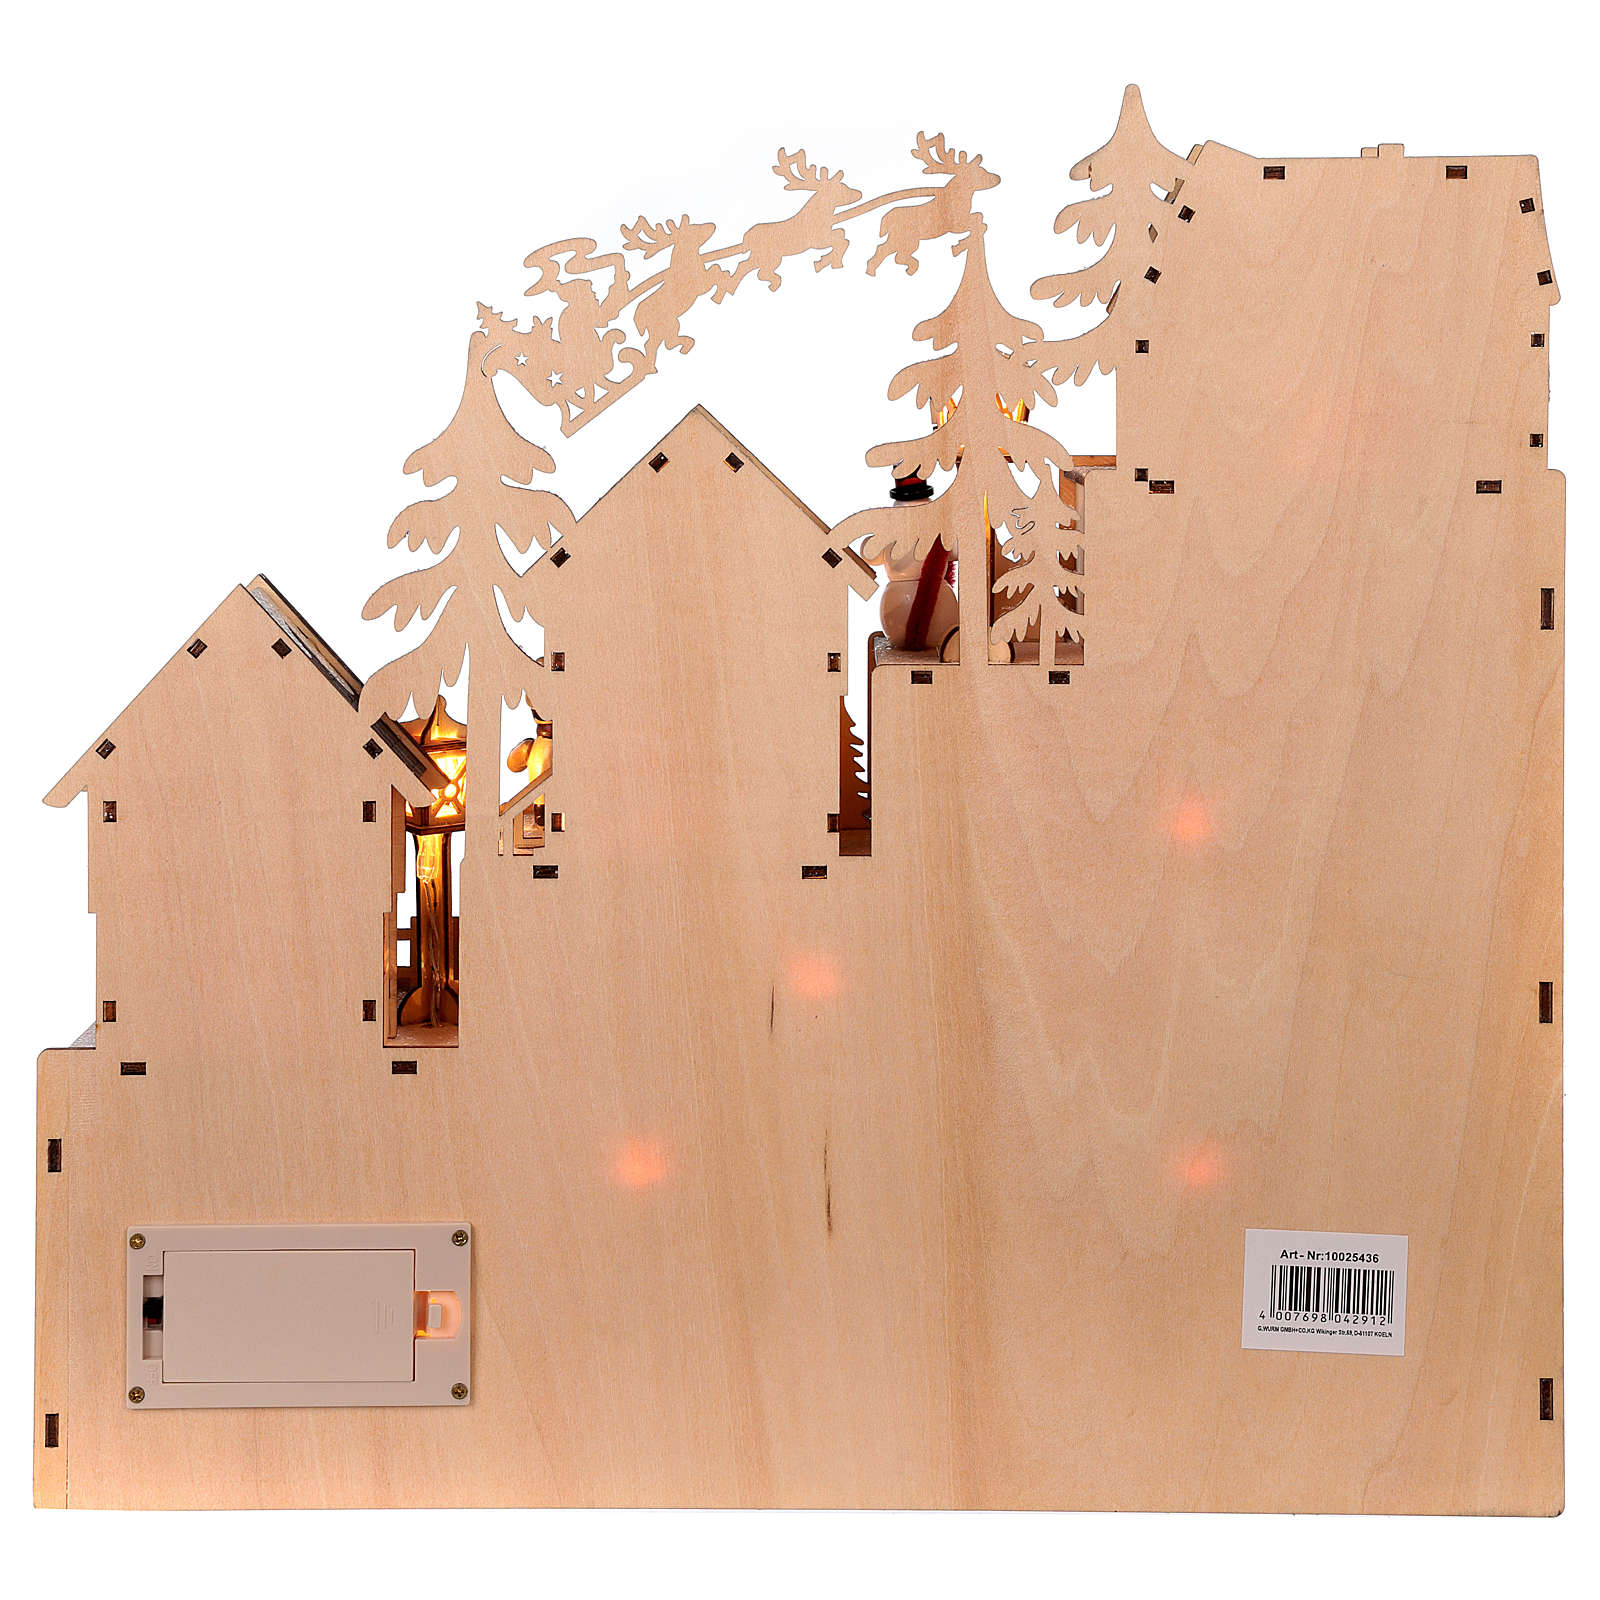 Calendario de Adviento 30x40x10 cm madera luces paisaje navideño 3